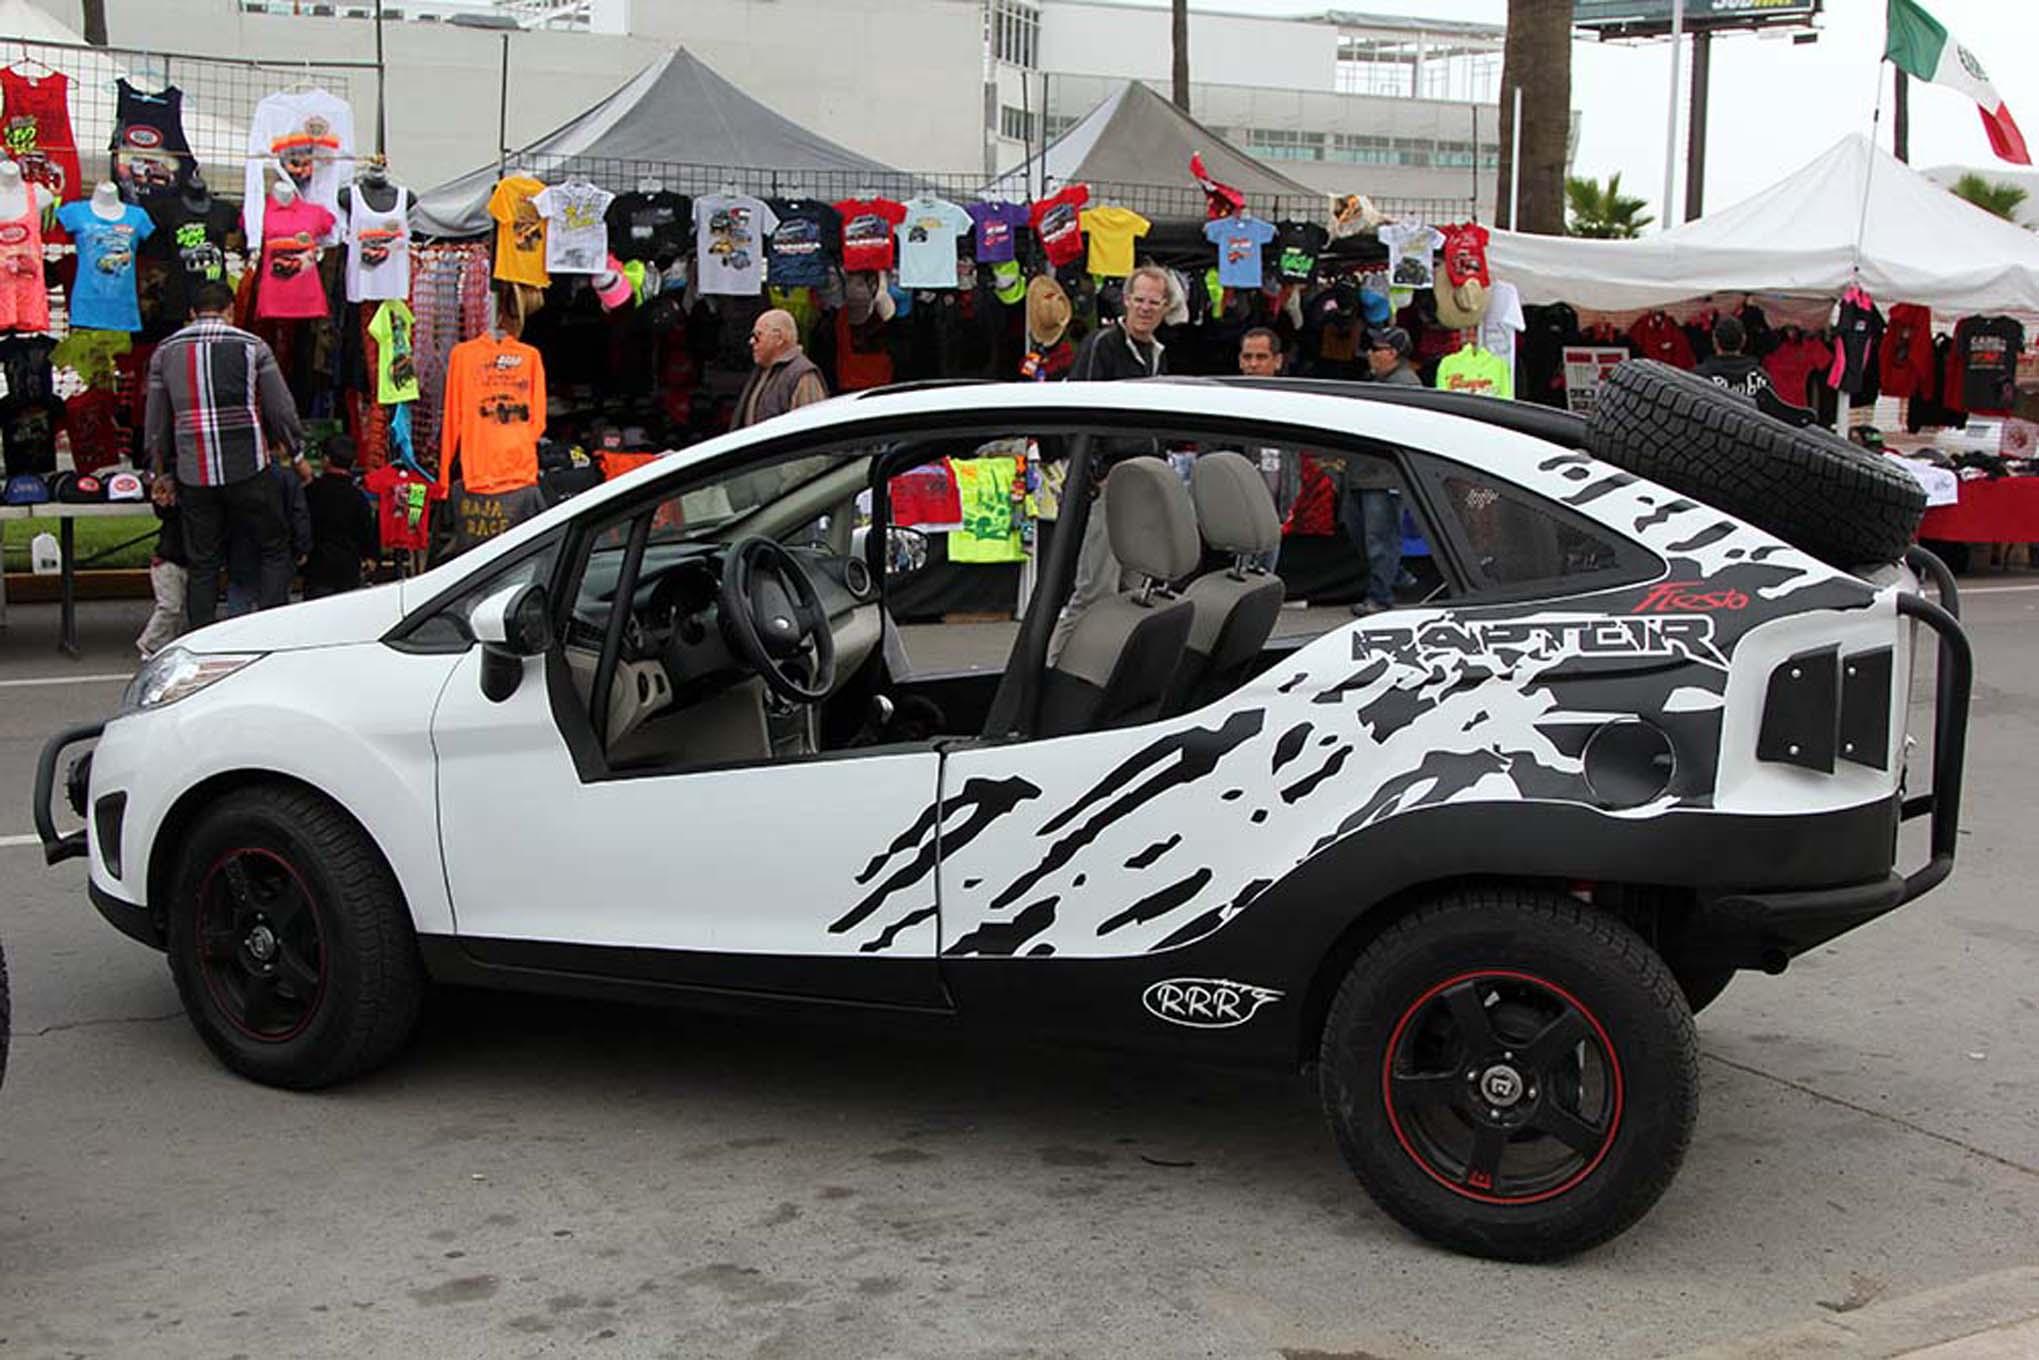 127NORRA Mexican 1000 BAJA offroad Race 2015 Manx Nova Chevy James Garner